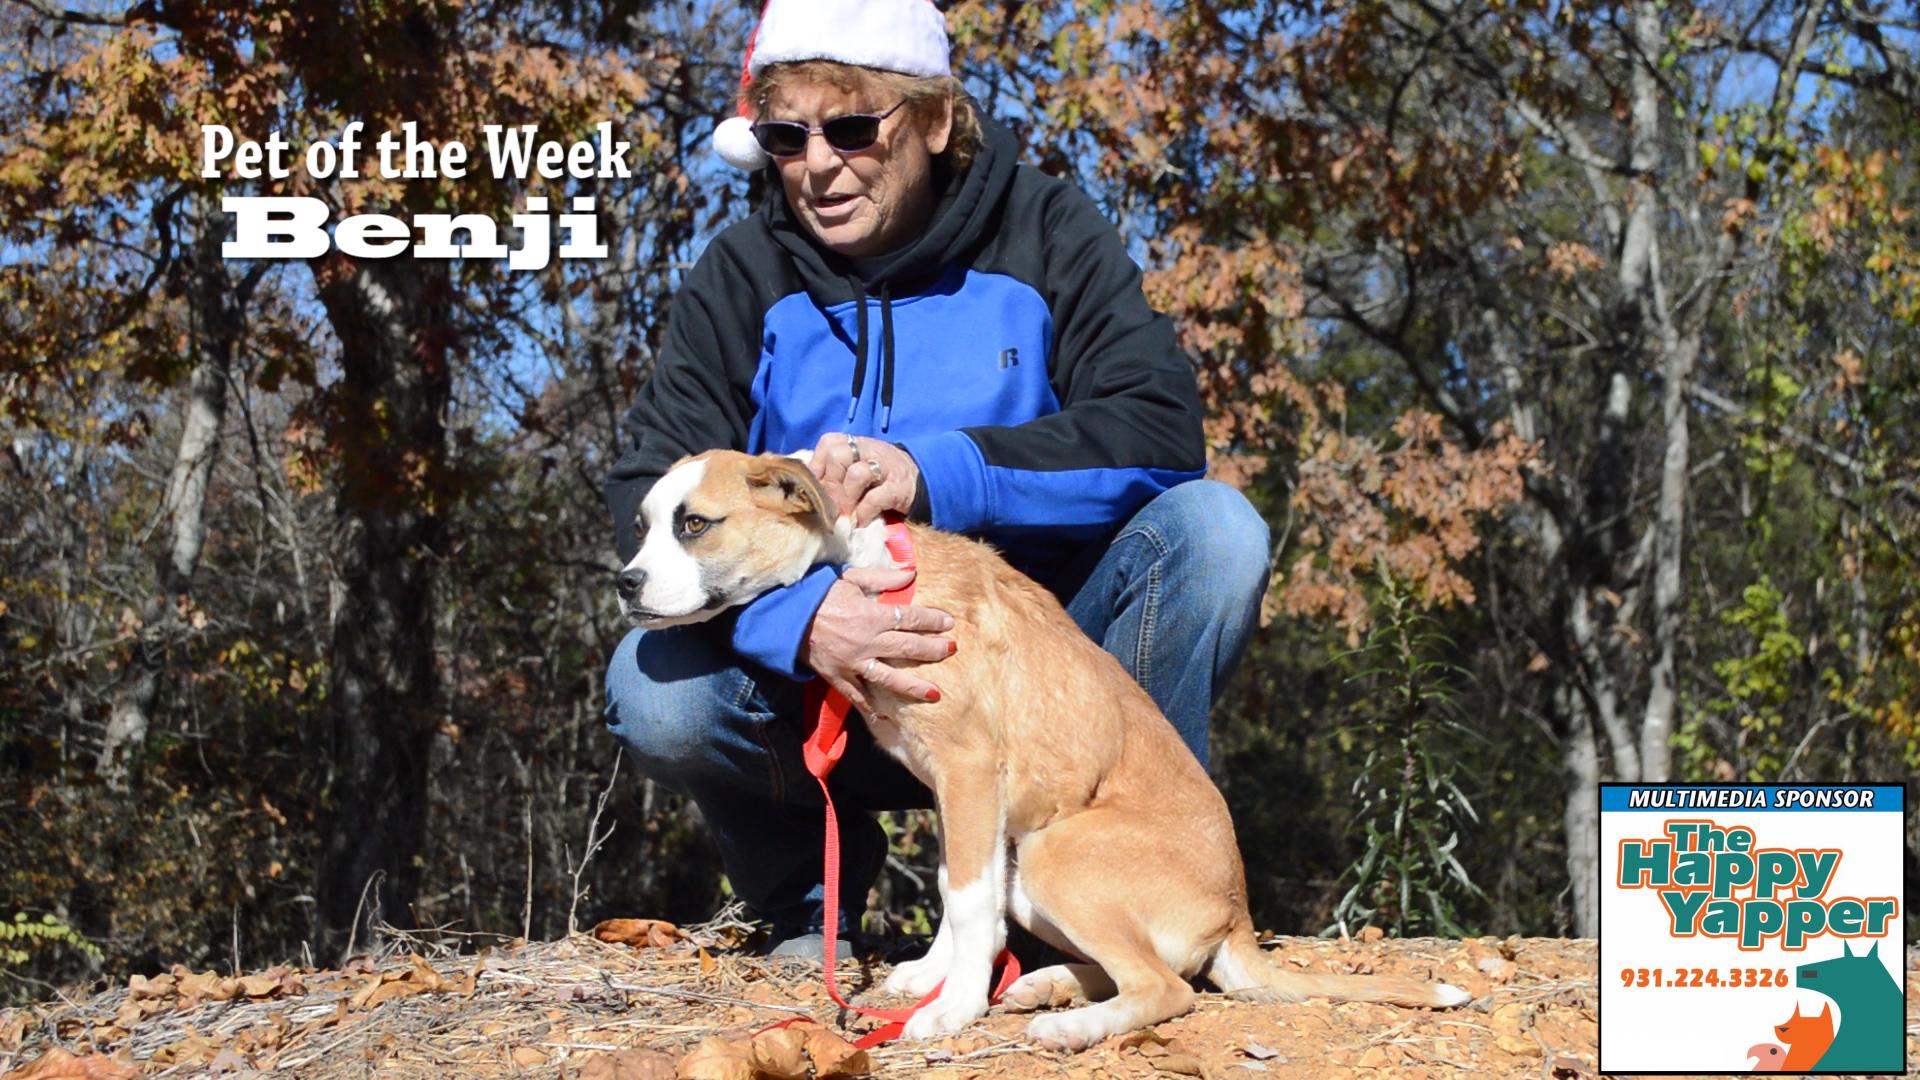 VIDEO: Pet of the Week - Benji